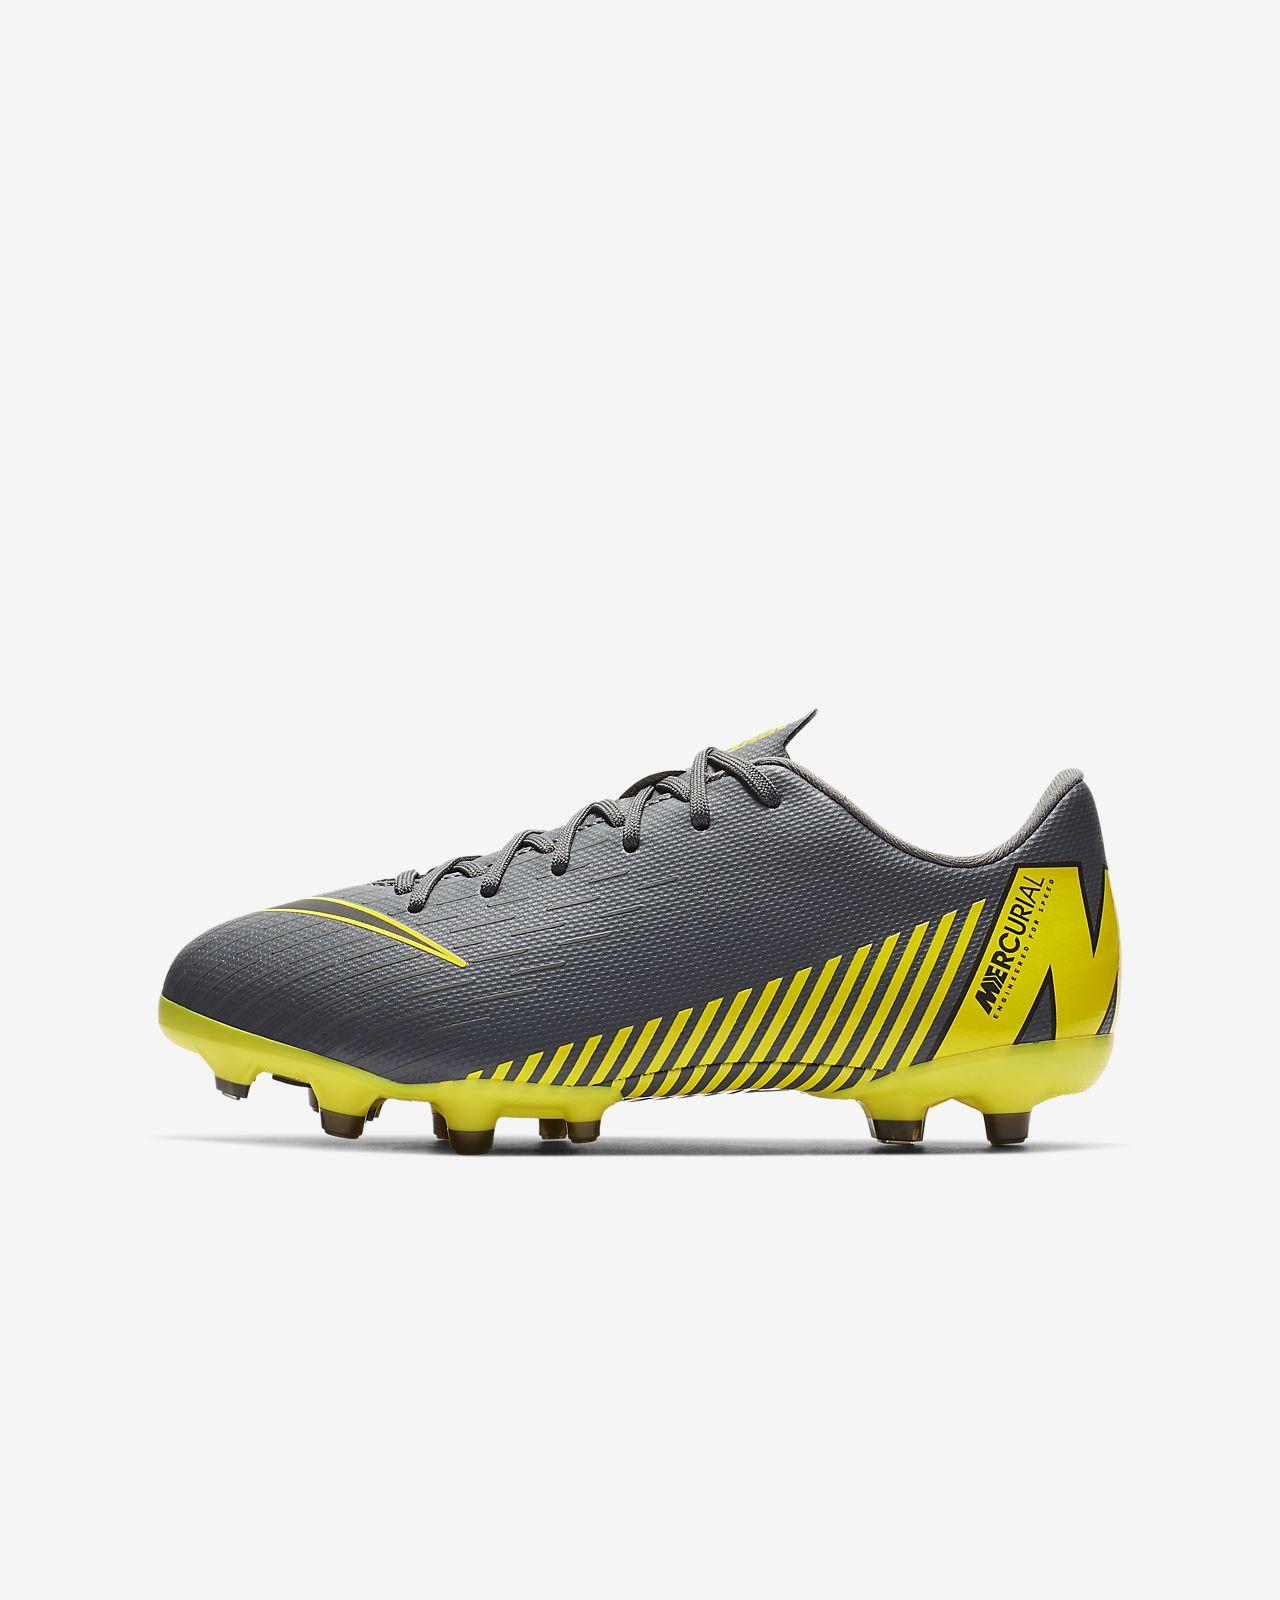 Nike Jr. Mercurial Vapor XII Academy Botas de fútbol para múltiples  superficies - Niño  a394552b2b4e2